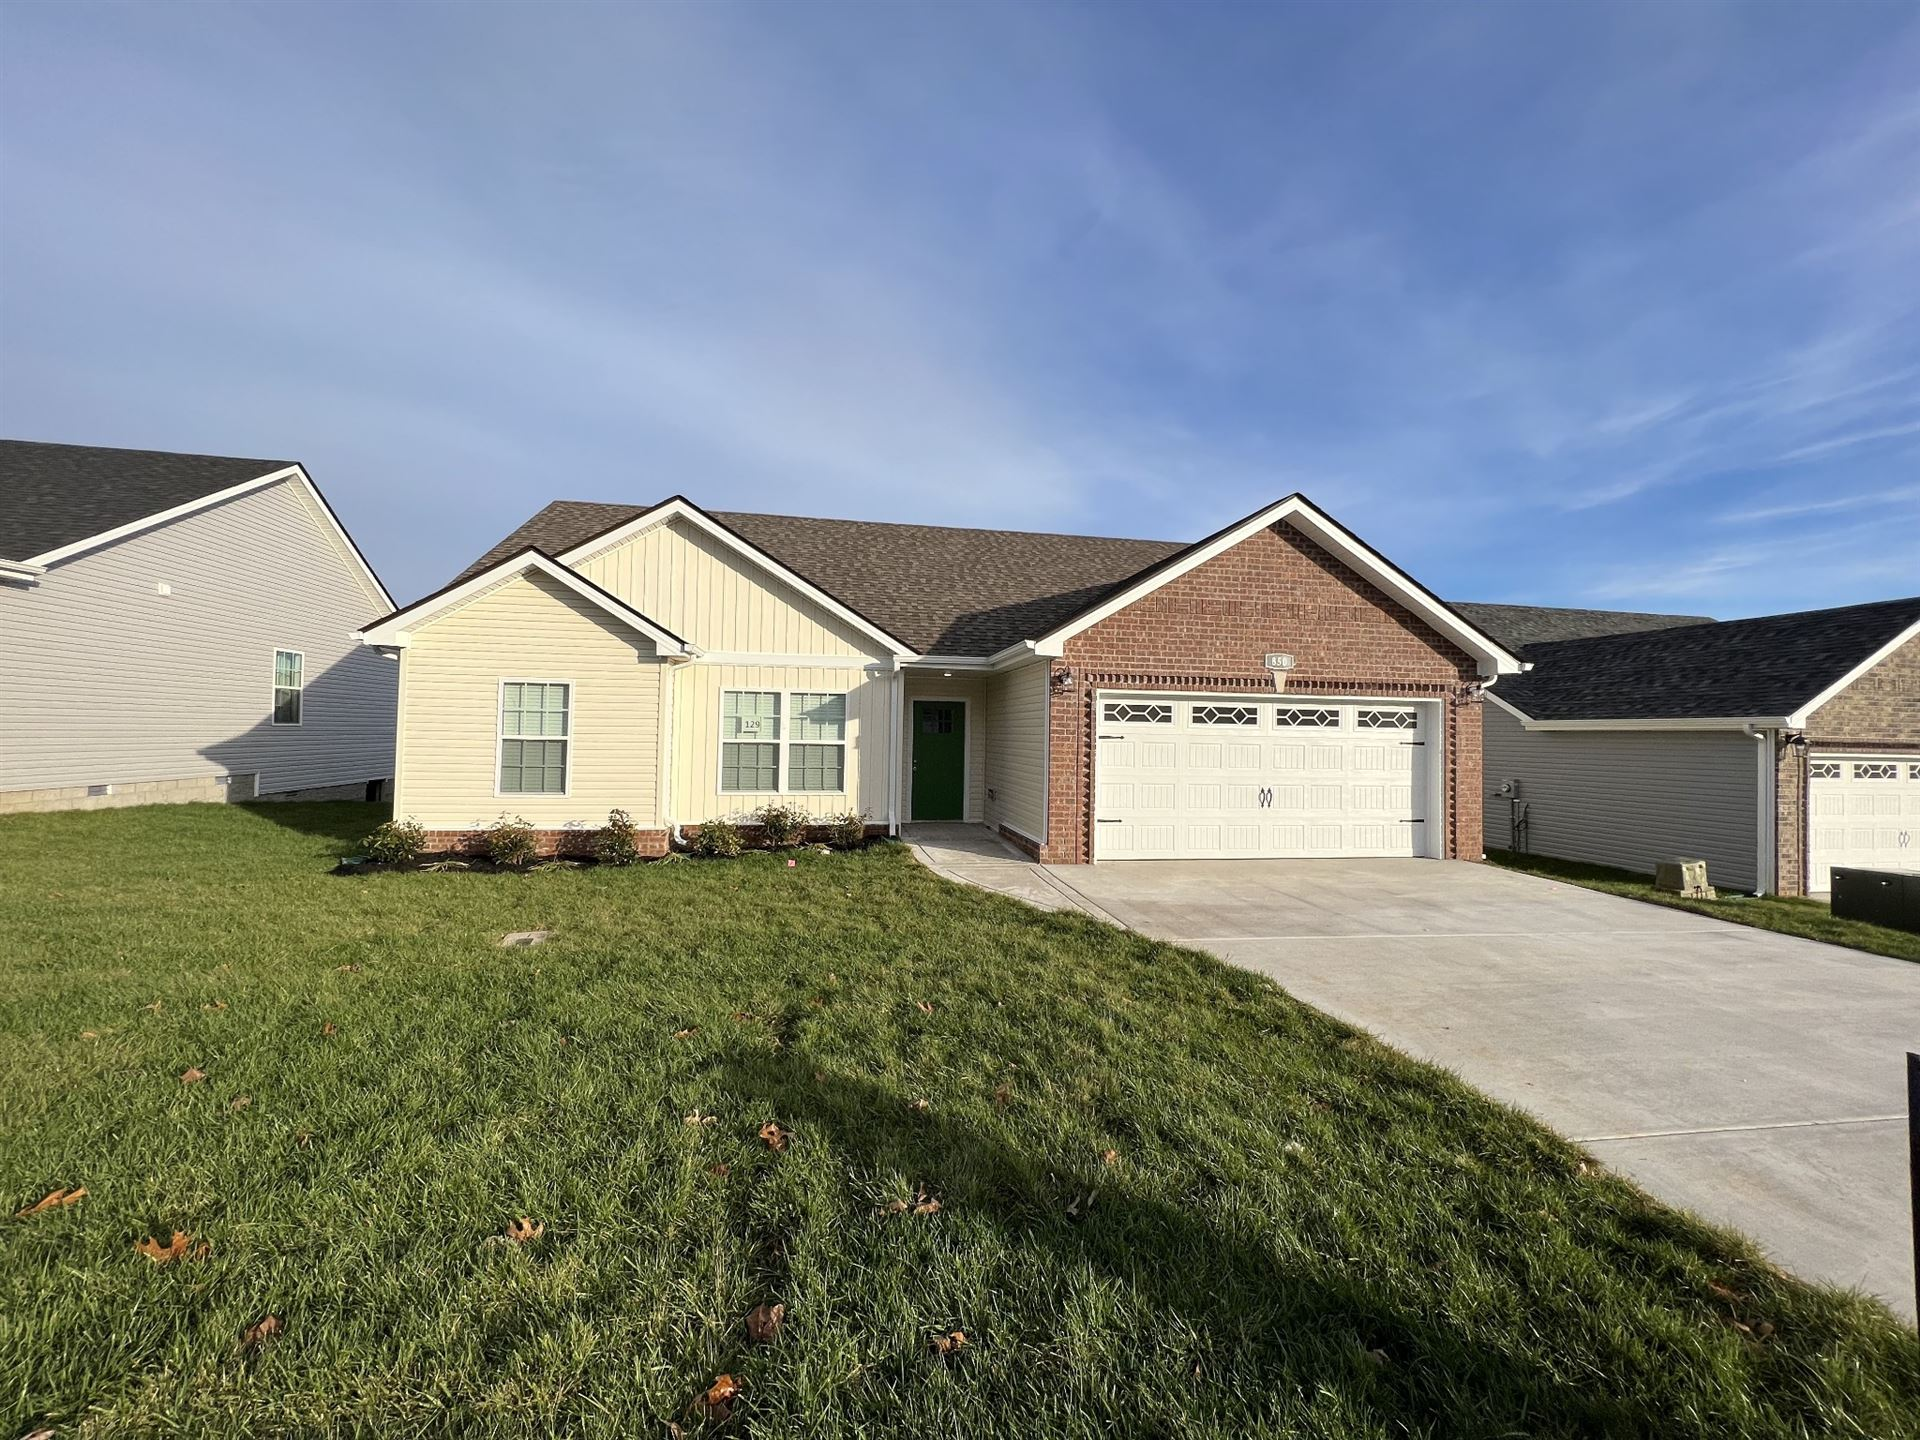 129 Irish Hills, Clarksville, TN 37042 - MLS#: 2292086